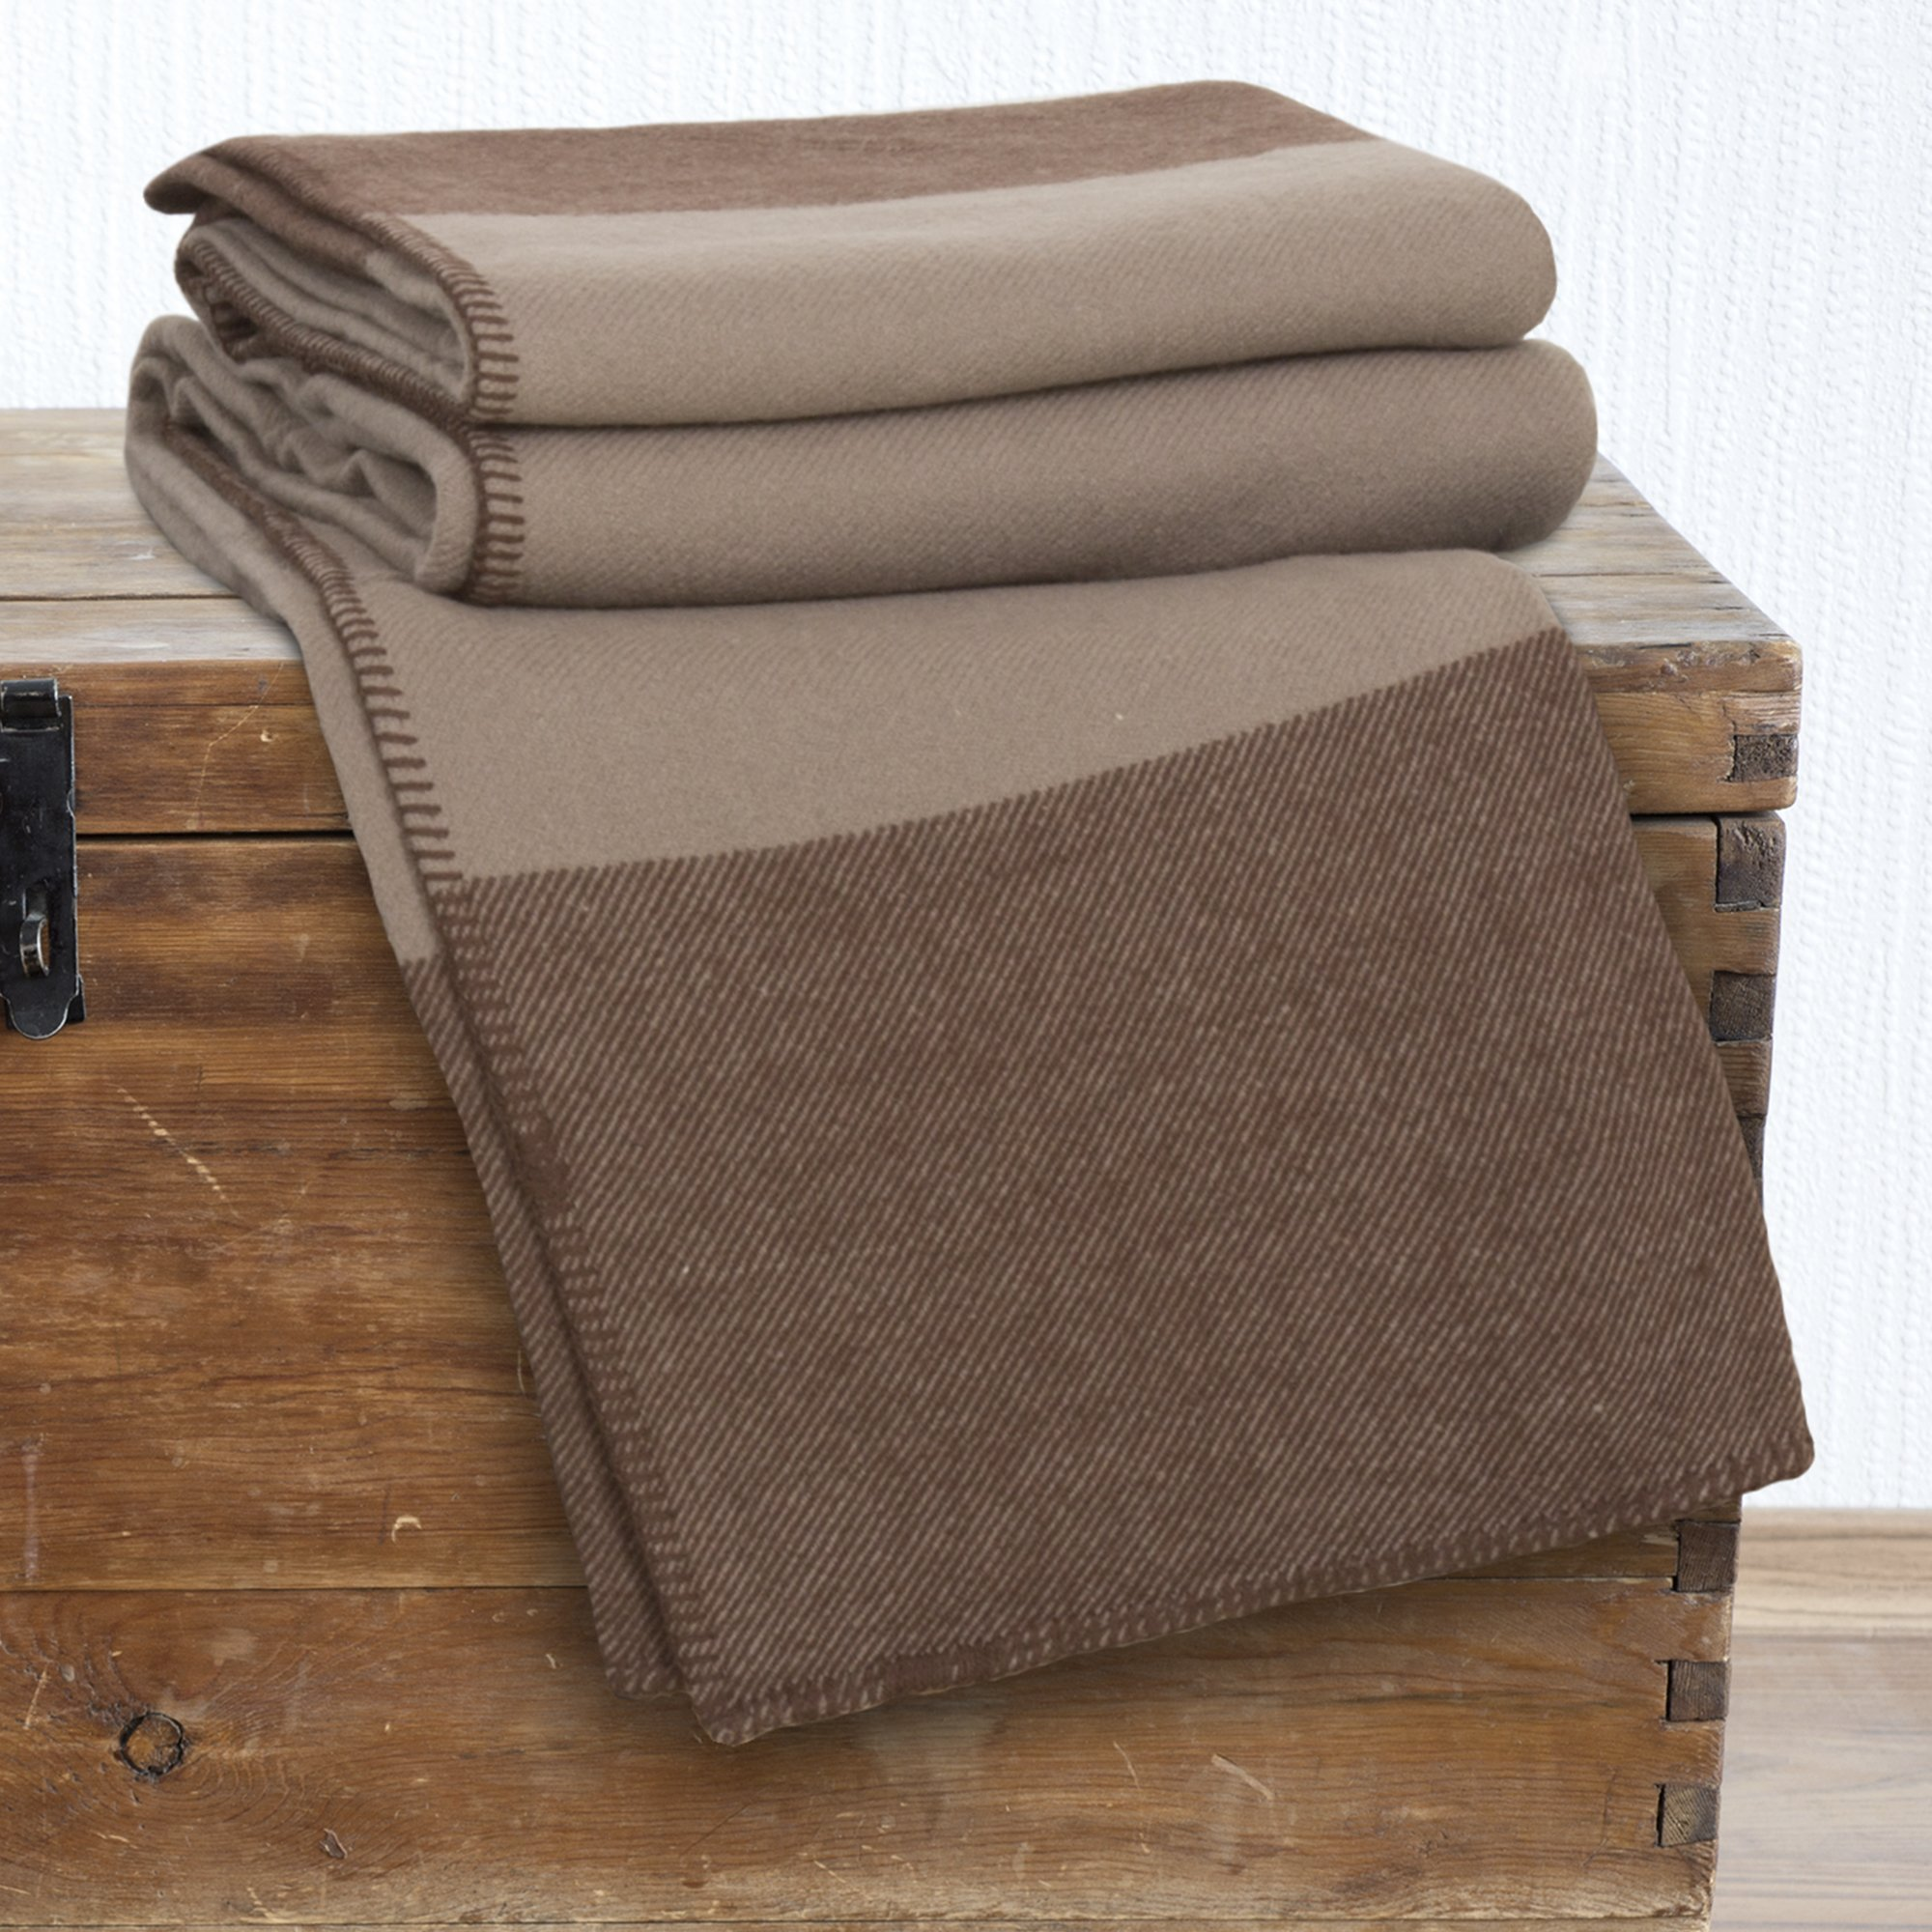 Lavish Home 100% Australian Wool Blanket, Full/Queen, Brown